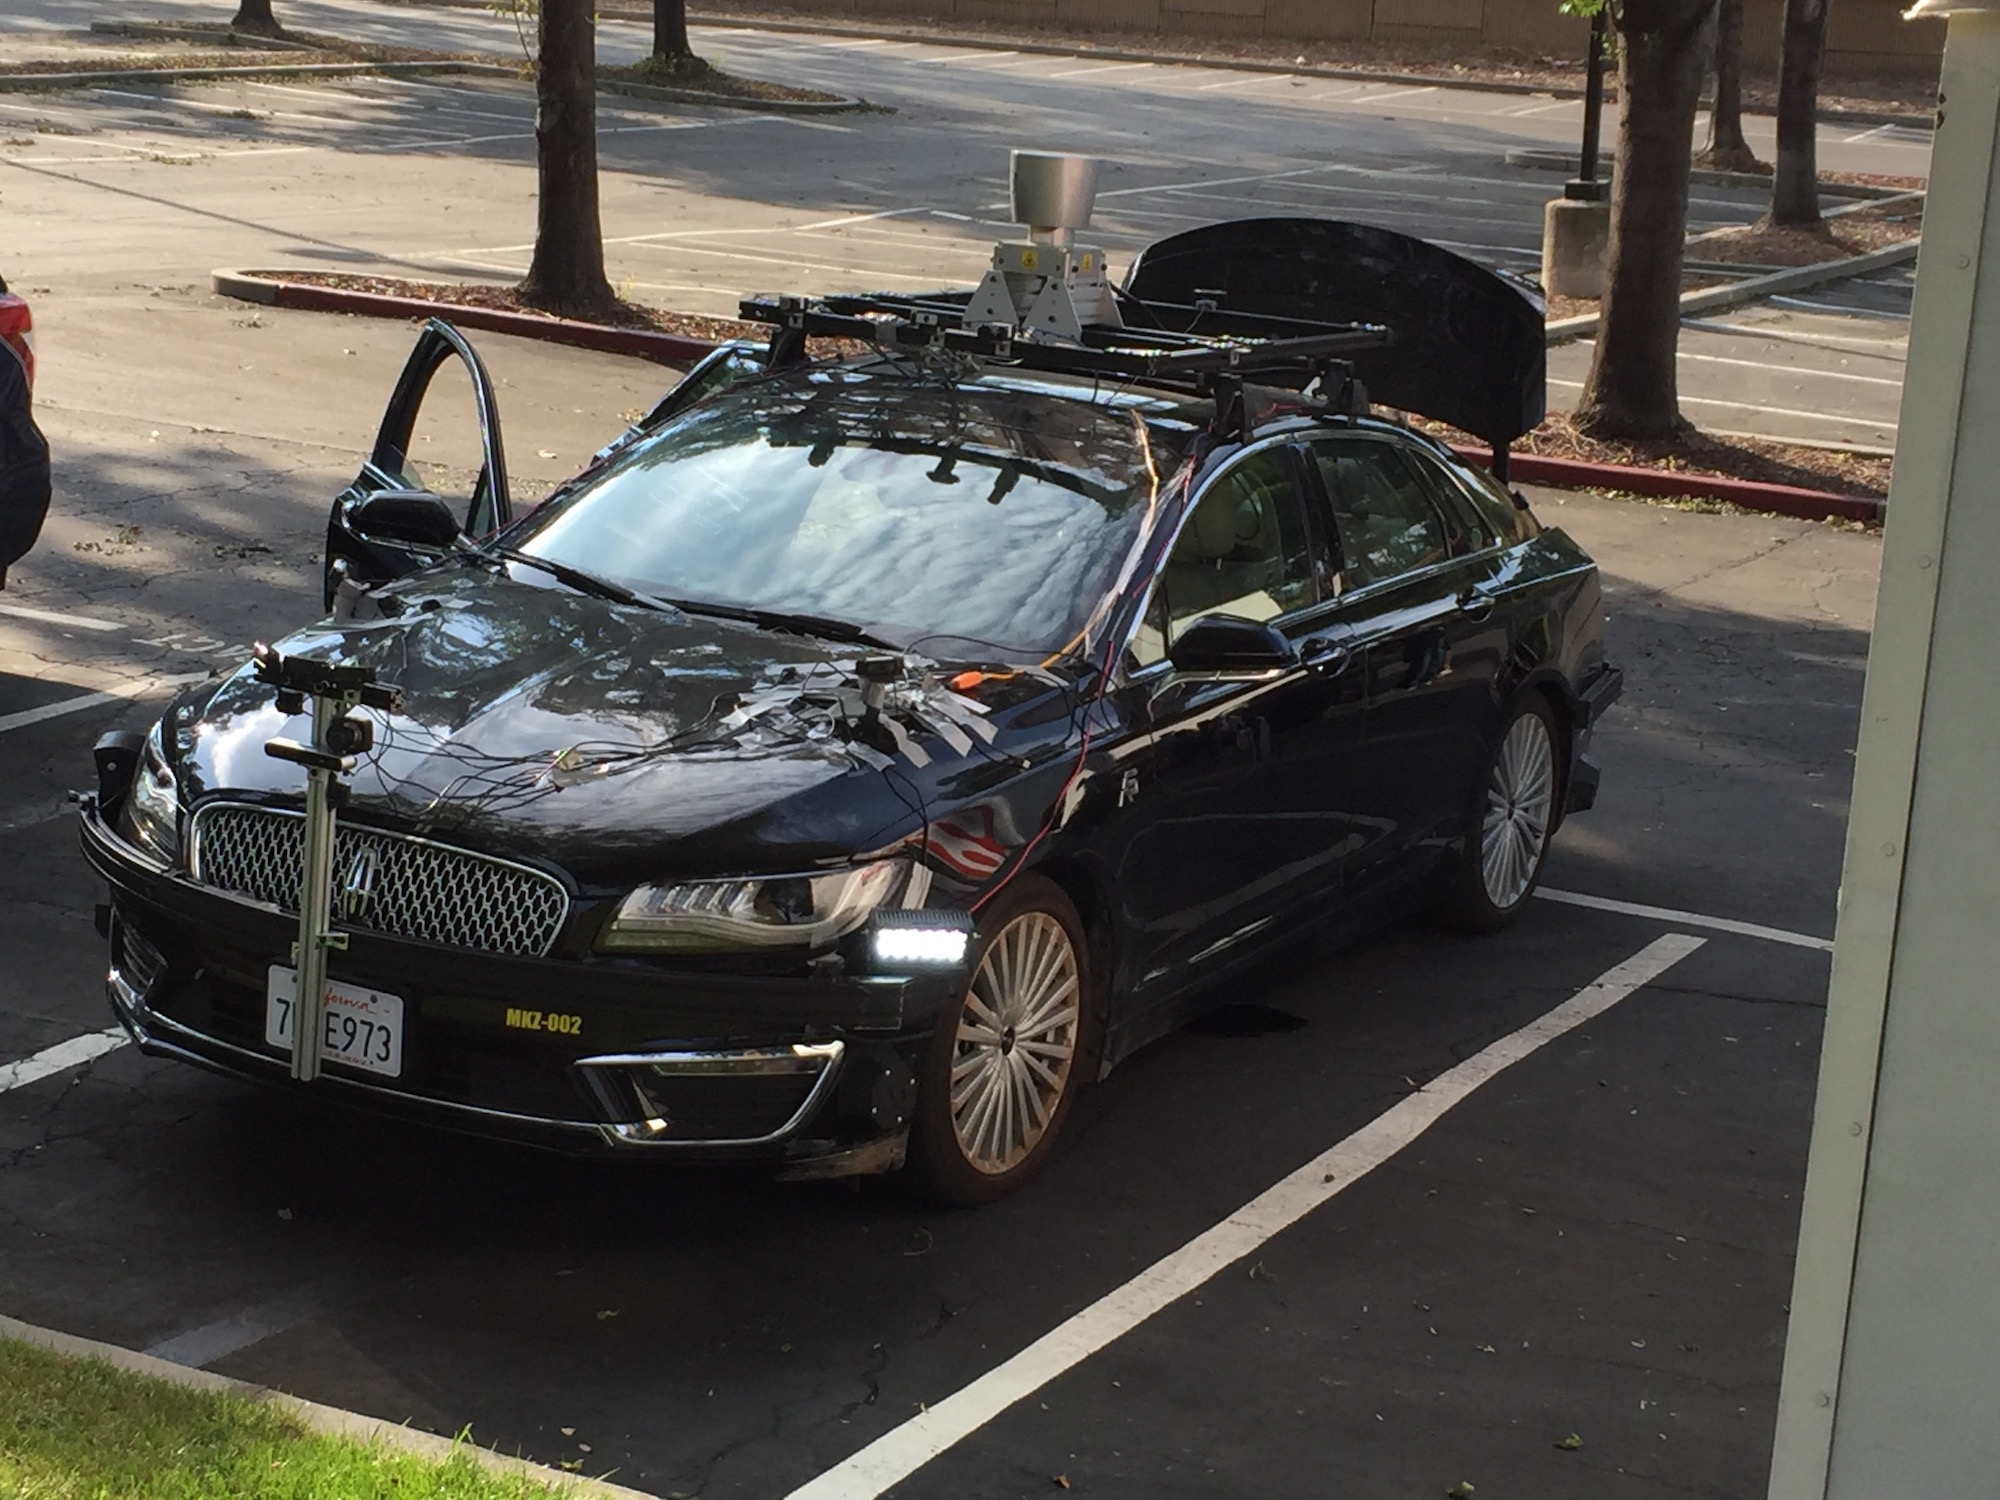 Kalifornien dmv reifer Fahrer